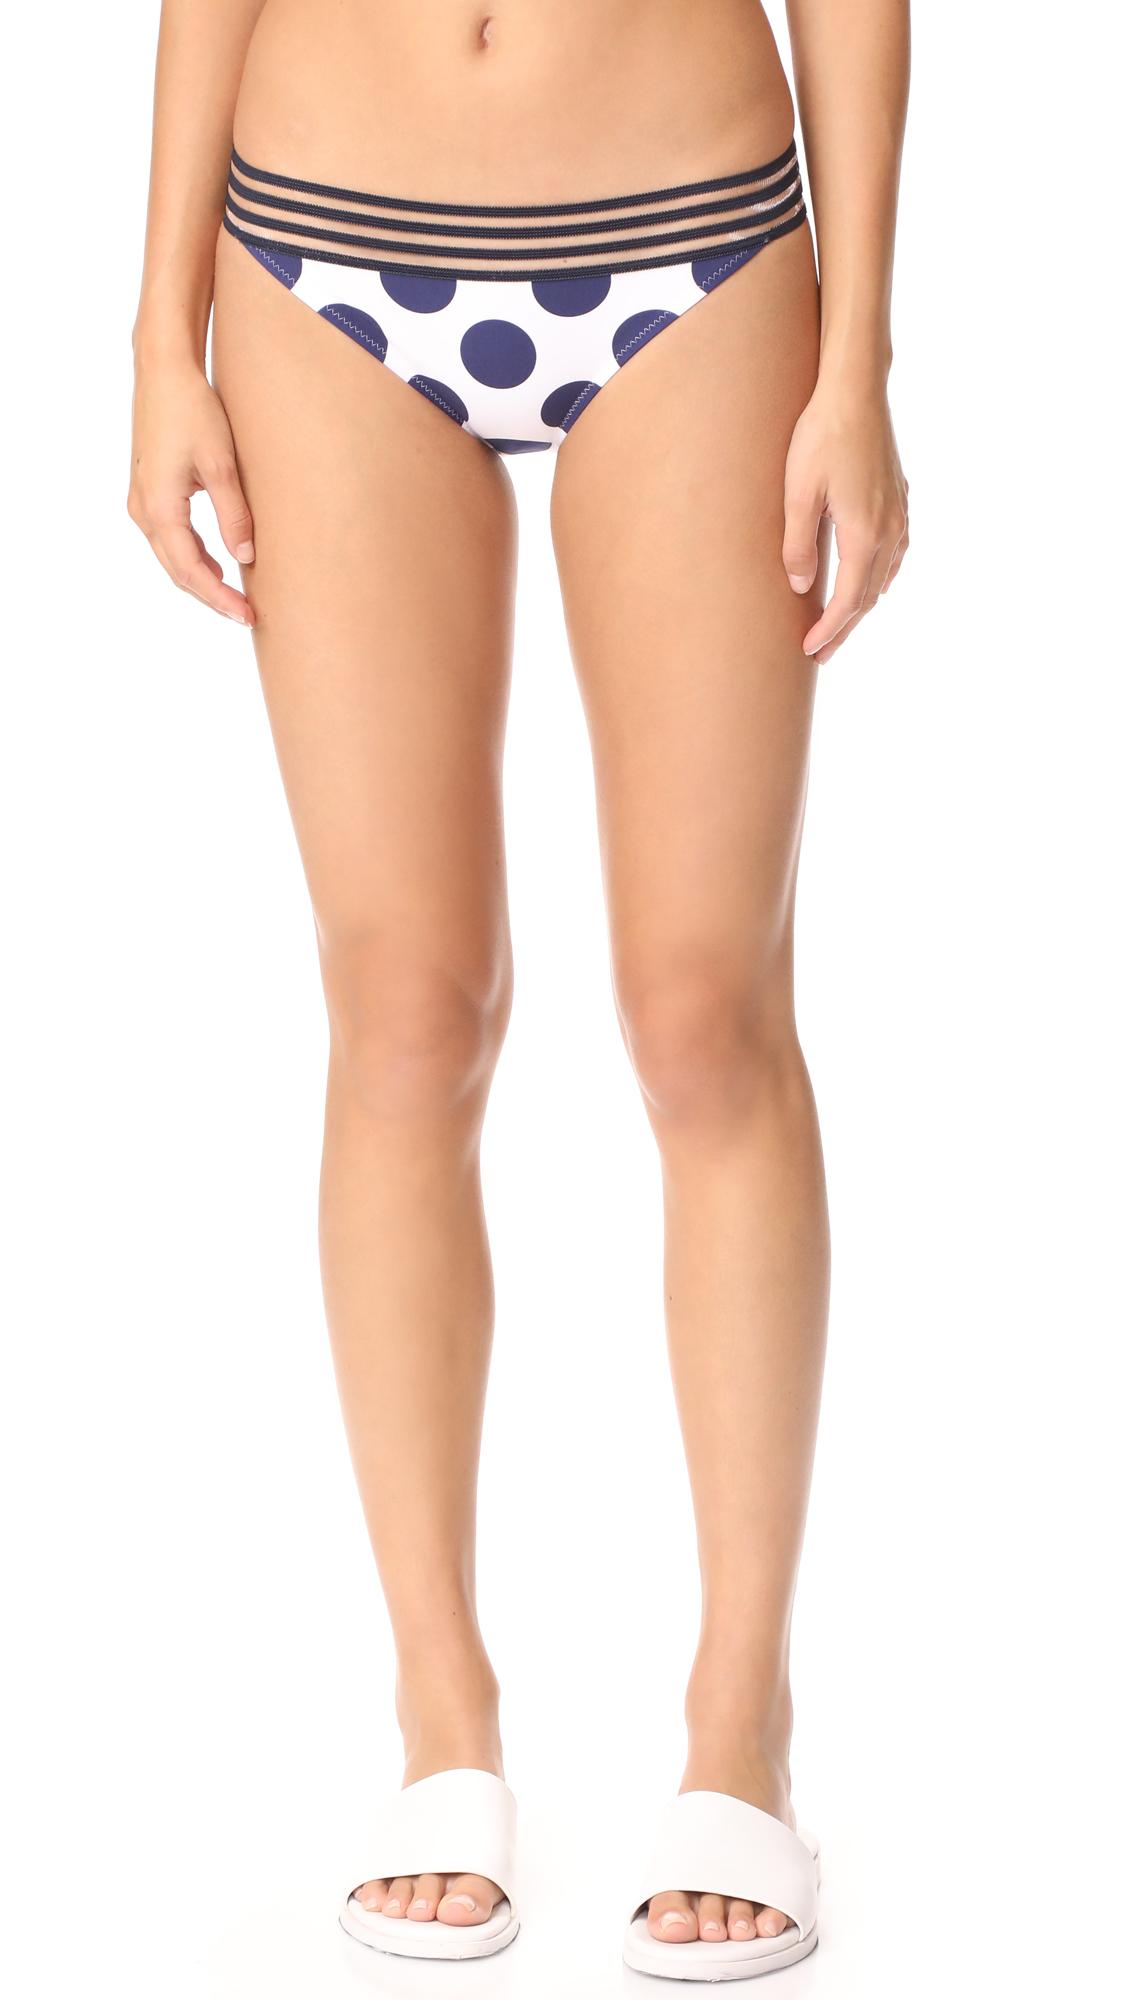 Emma Pake Adriana Bikini Bottoms - Polka Dot